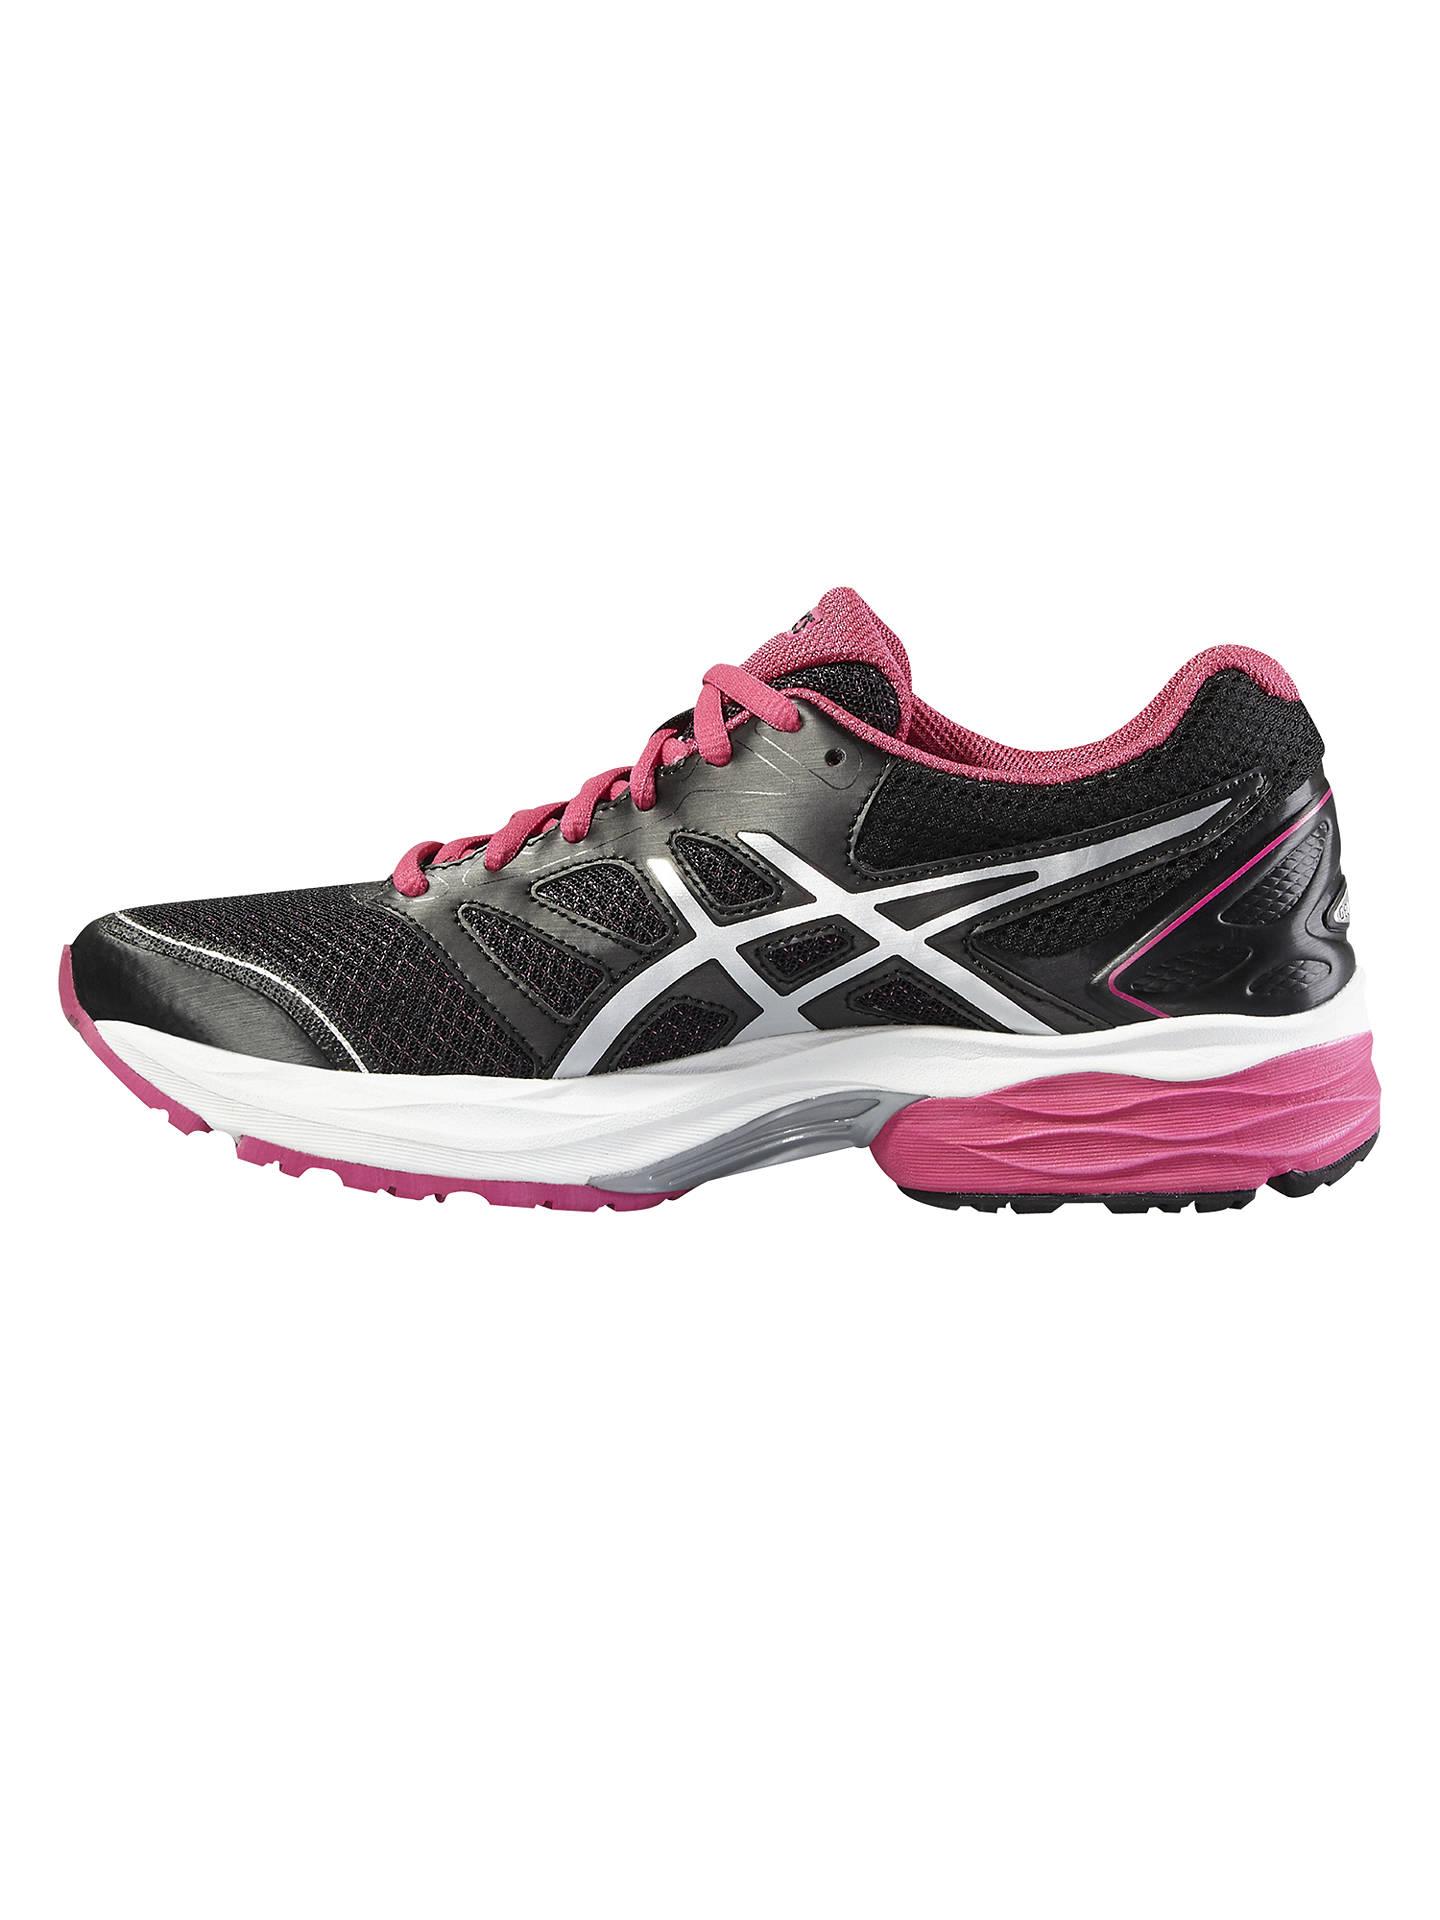 782d3951 Asics Gel-Pulse 8 Women's Running Shoes at John Lewis & Partners